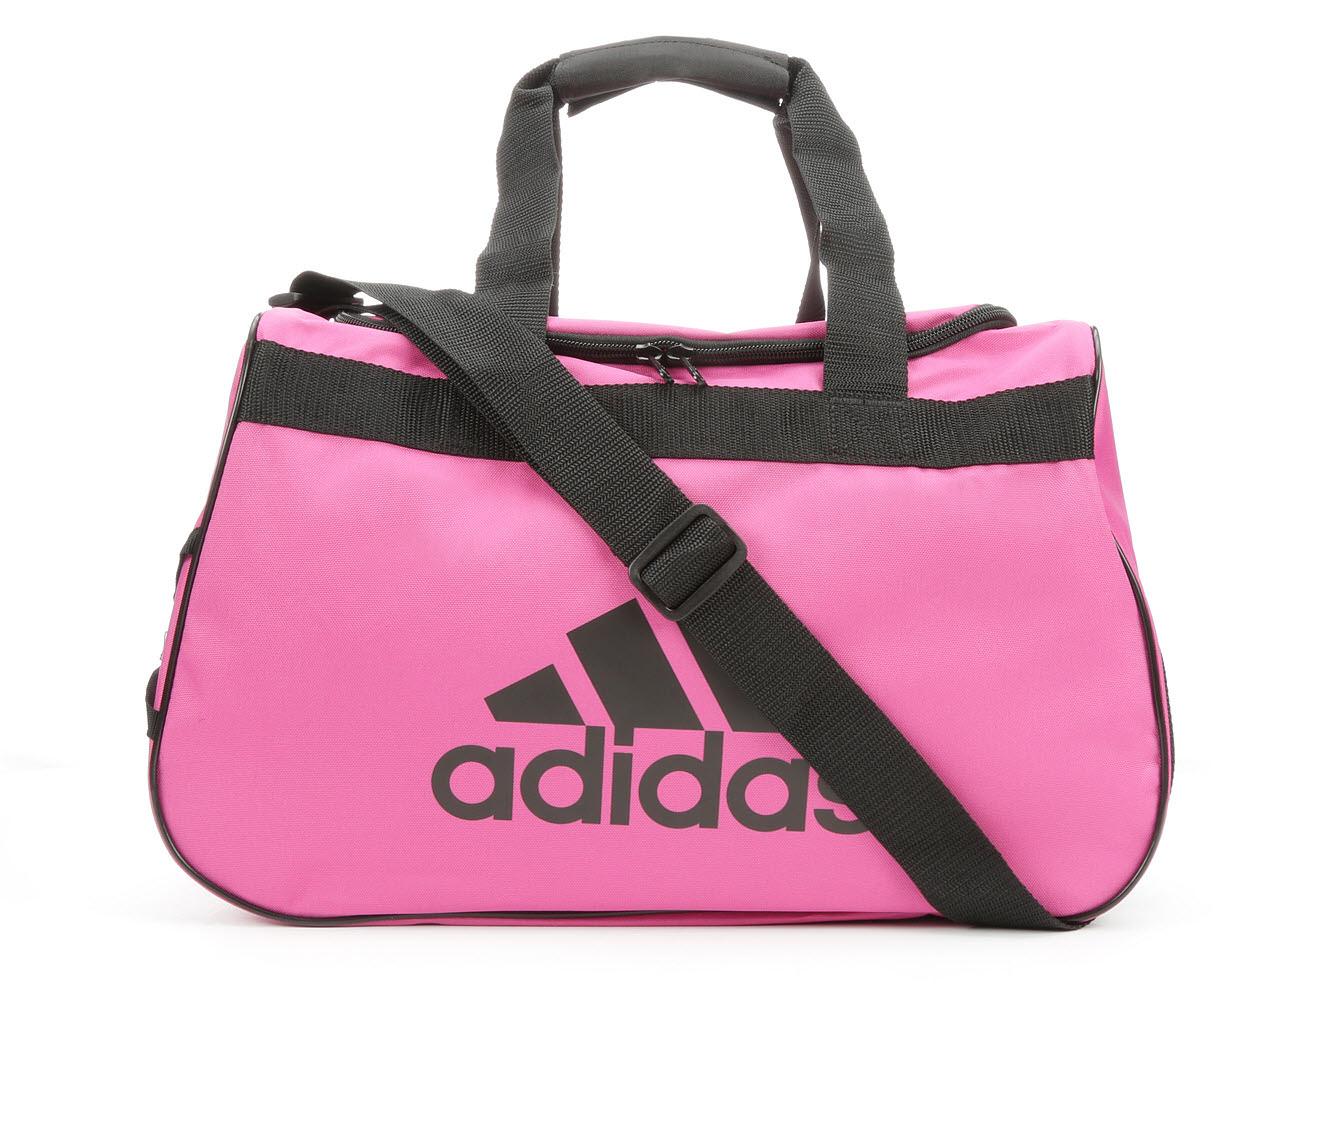 Image of Adidas Diablo Small Duffel